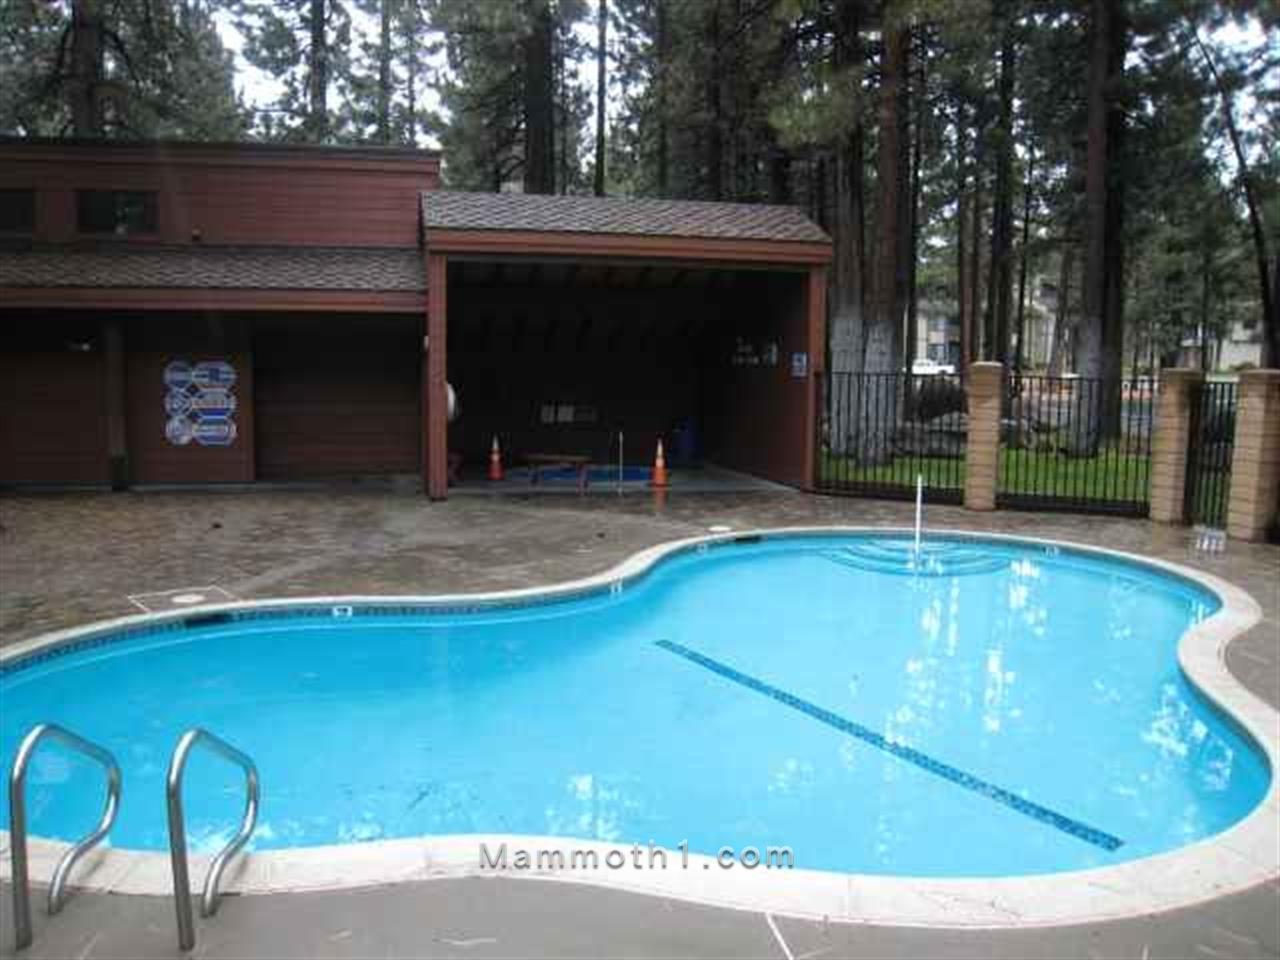 Mammoth Lakes Condo HOA Fees Winterset Condos for Sale